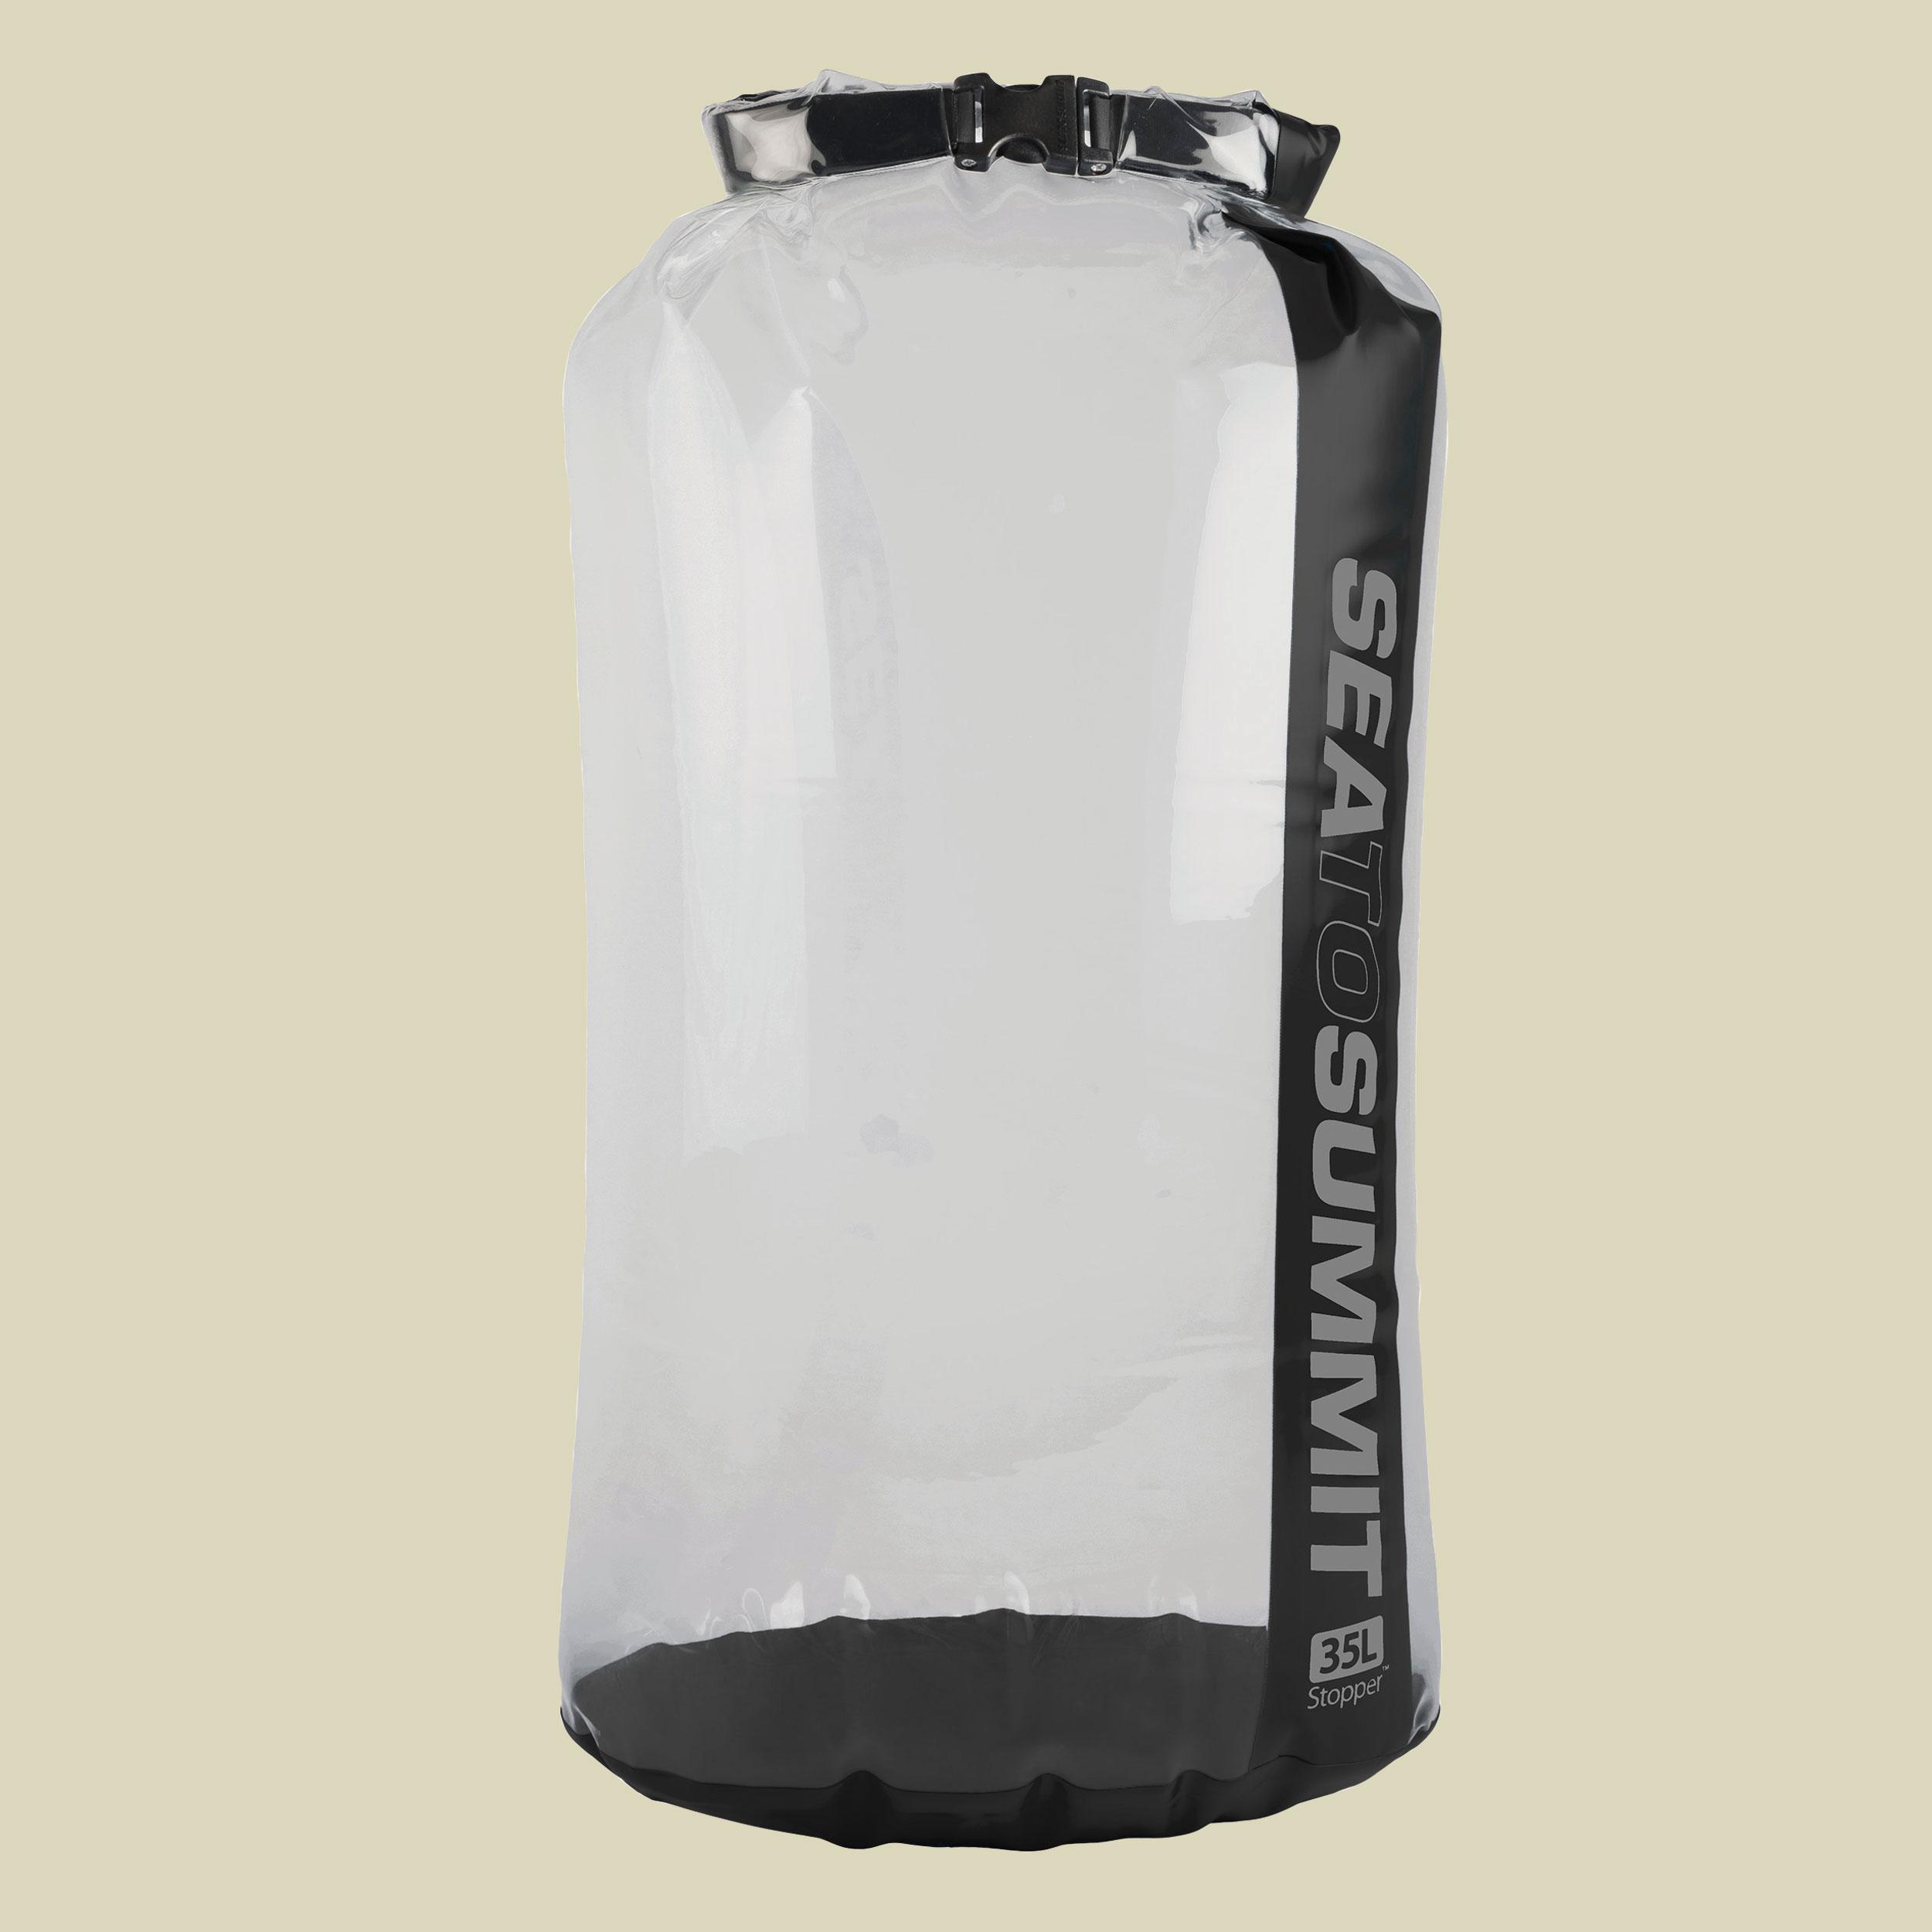 Image of Sea to Summit Stopper Clear Dry Bag Packsack Gr 35 l grau/schwarz